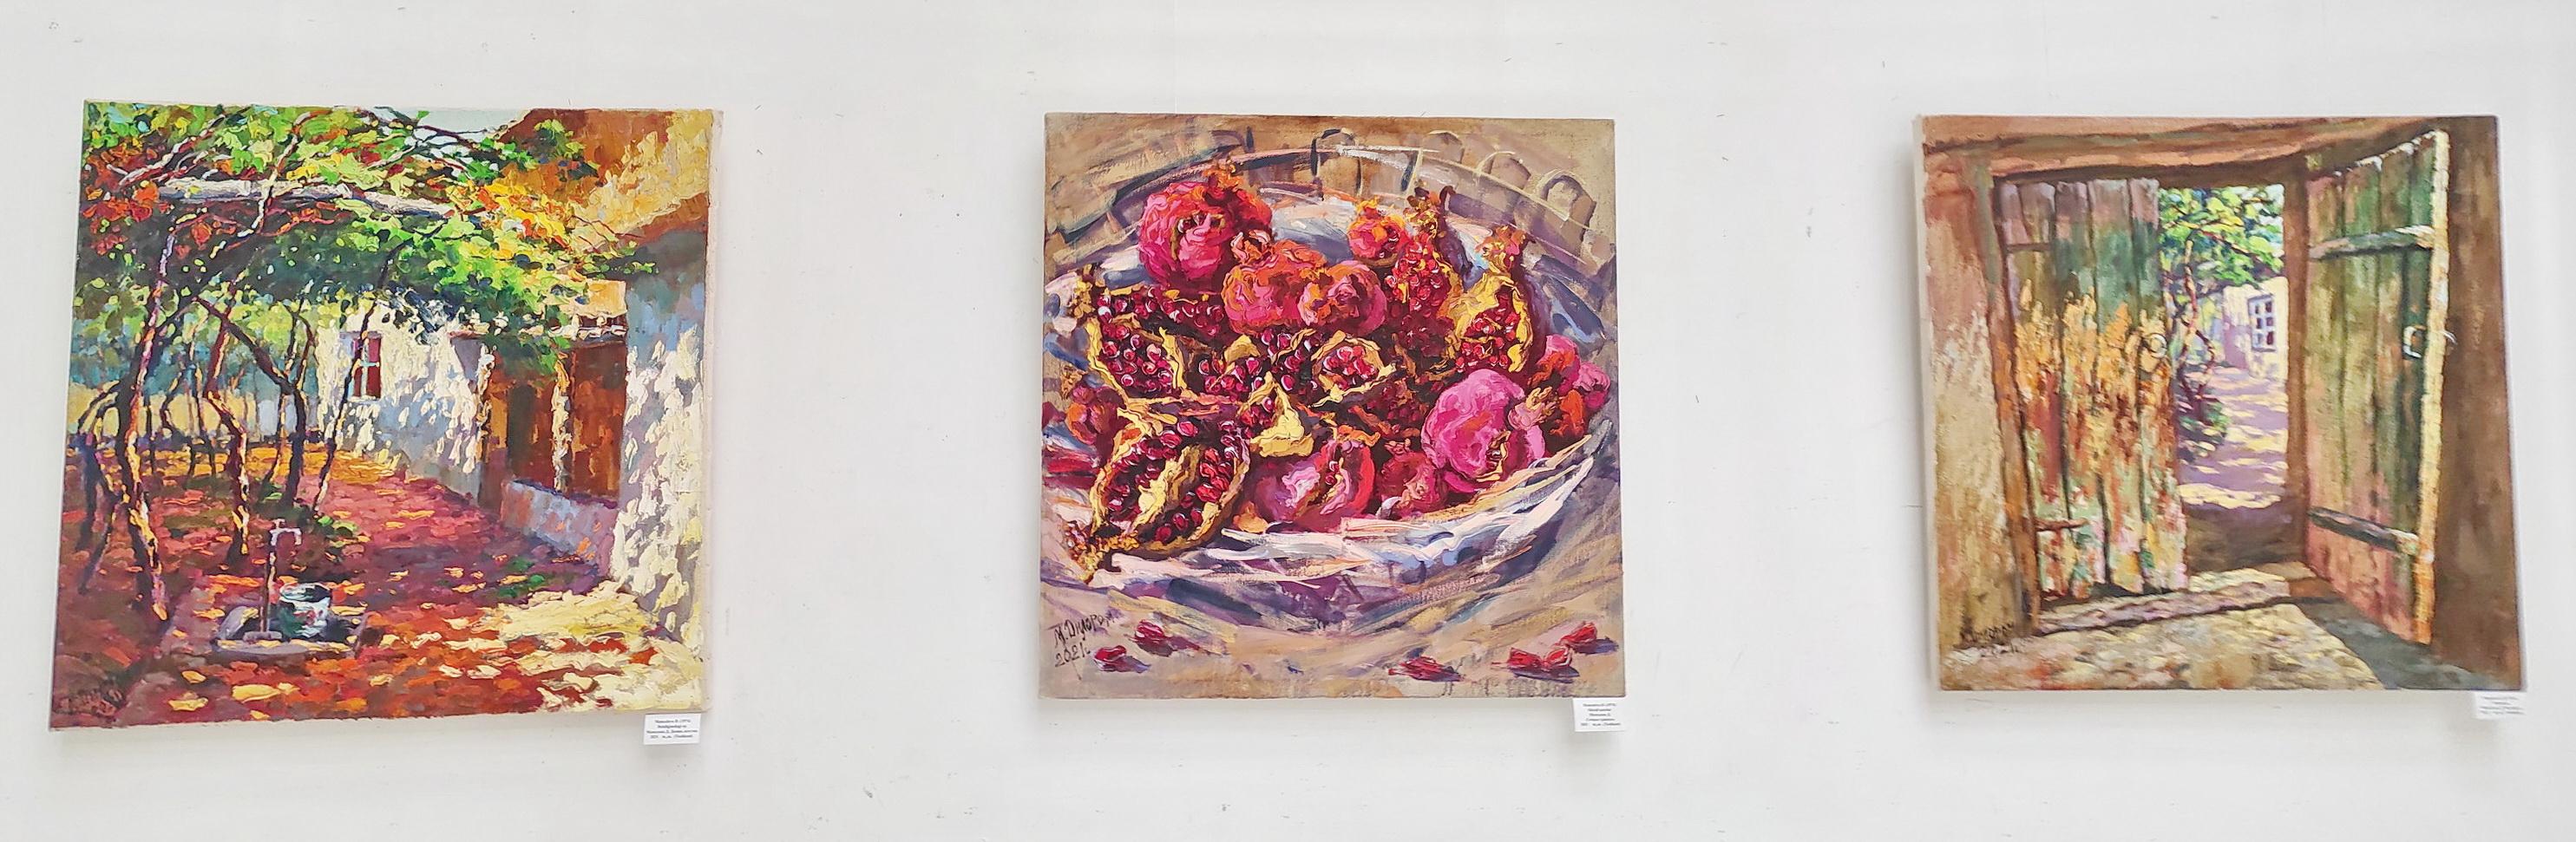 Мамедова Дилором. Экспозиция картин. 2021